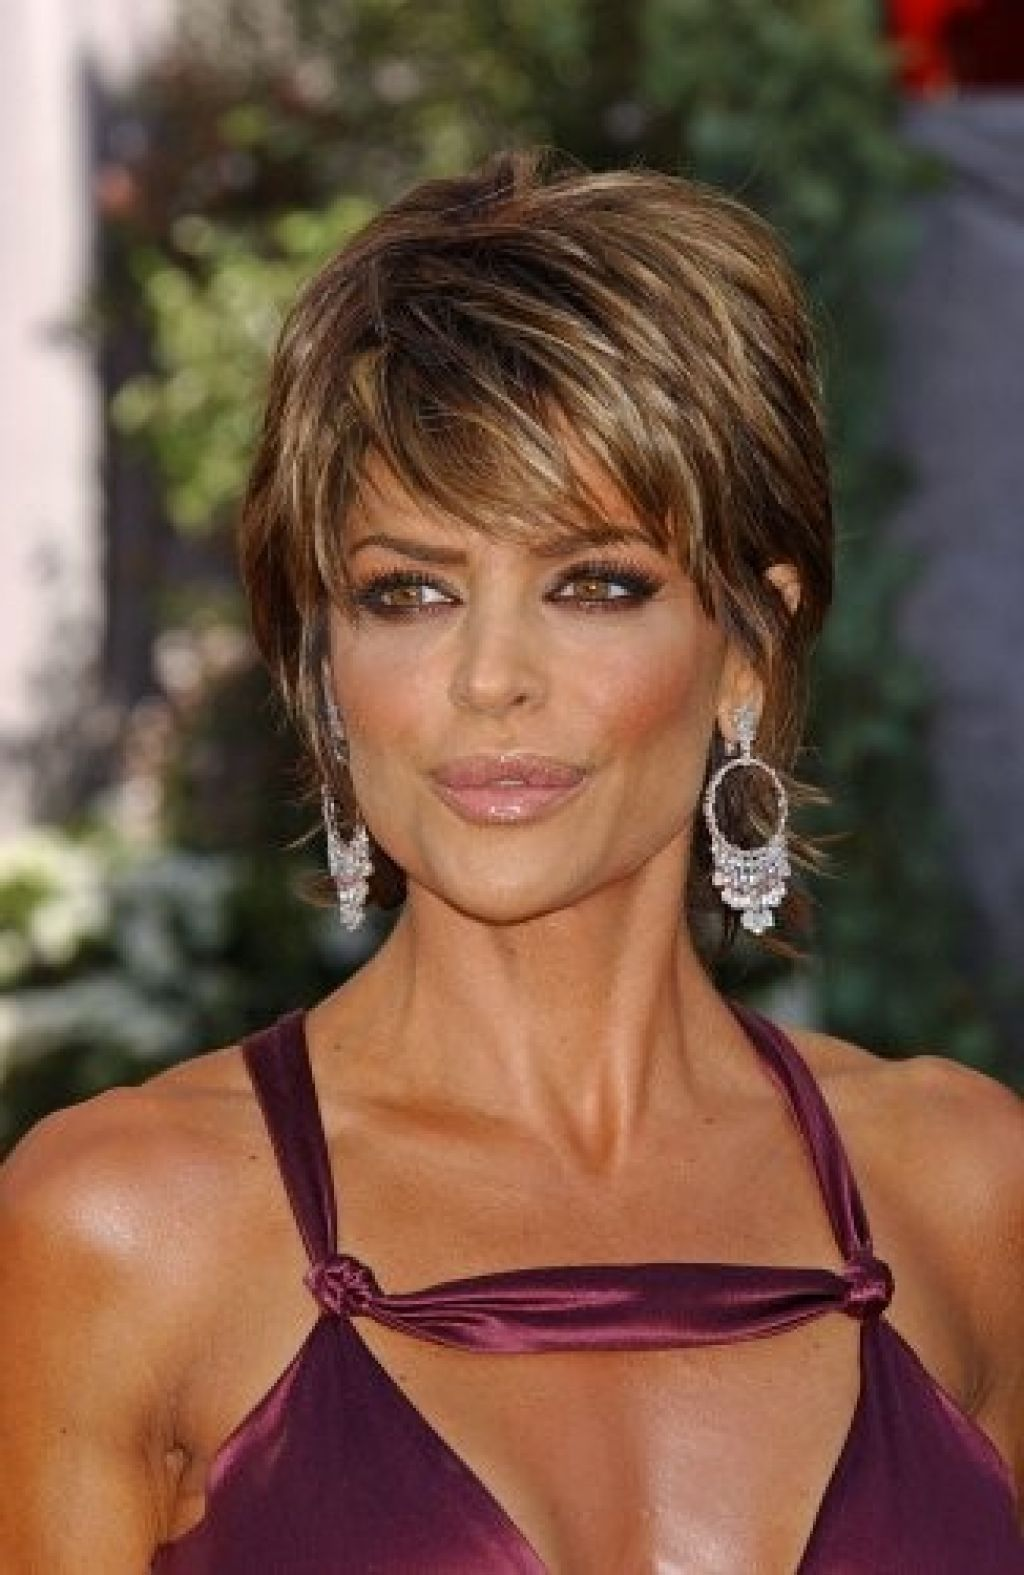 Short Shaggy Hairstyles Short Shaggy Hairstyles For Fine Hair  Women Medium Hairstyle